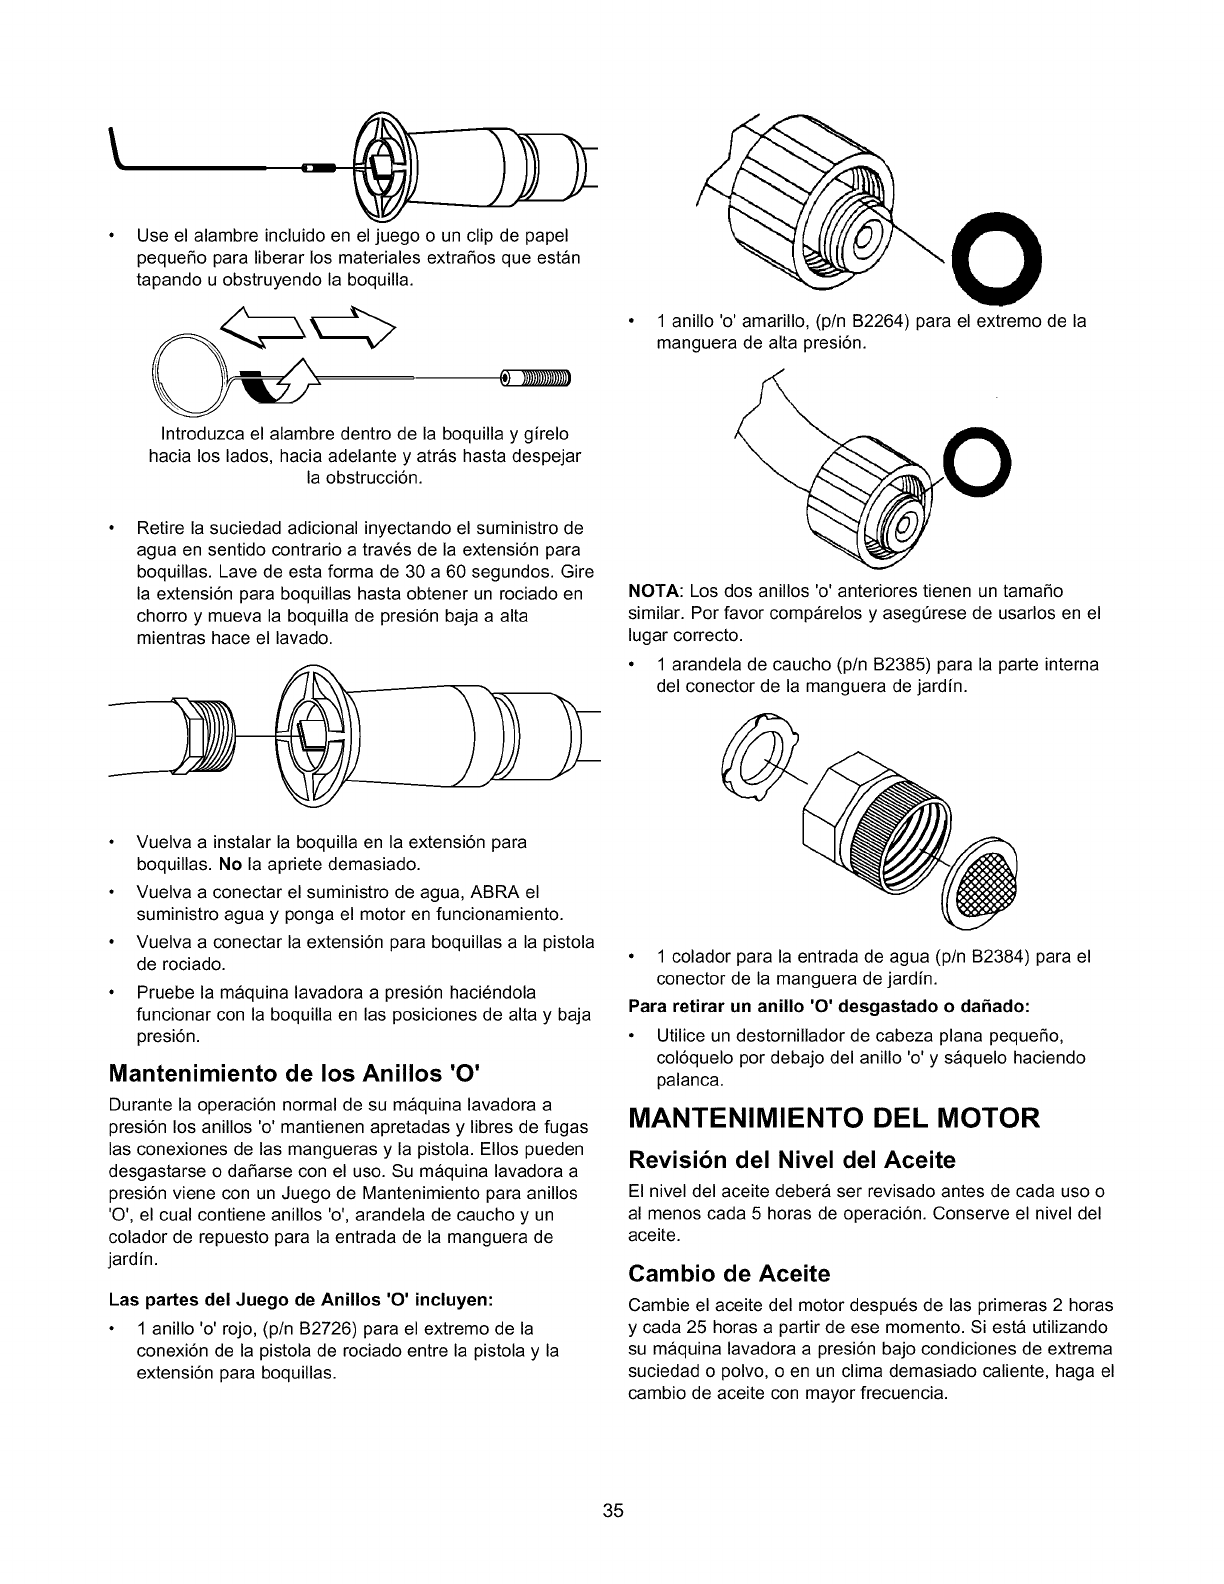 Craftsman 580768311 User Manual Pressure Washer Manuals And Guides Ring Flat Baja M8 Use